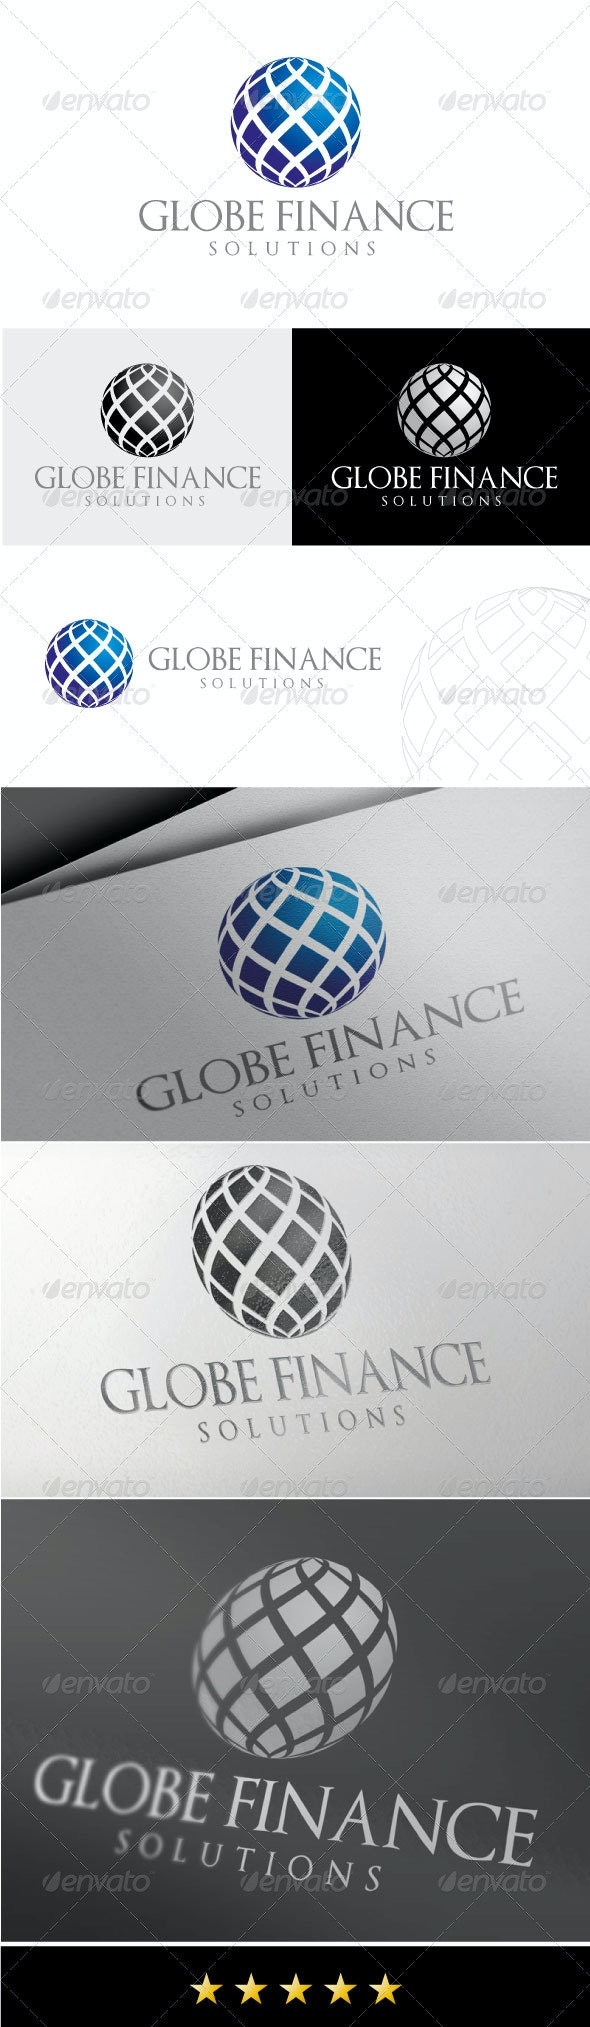 Globe Finance Logo - Vector Abstract